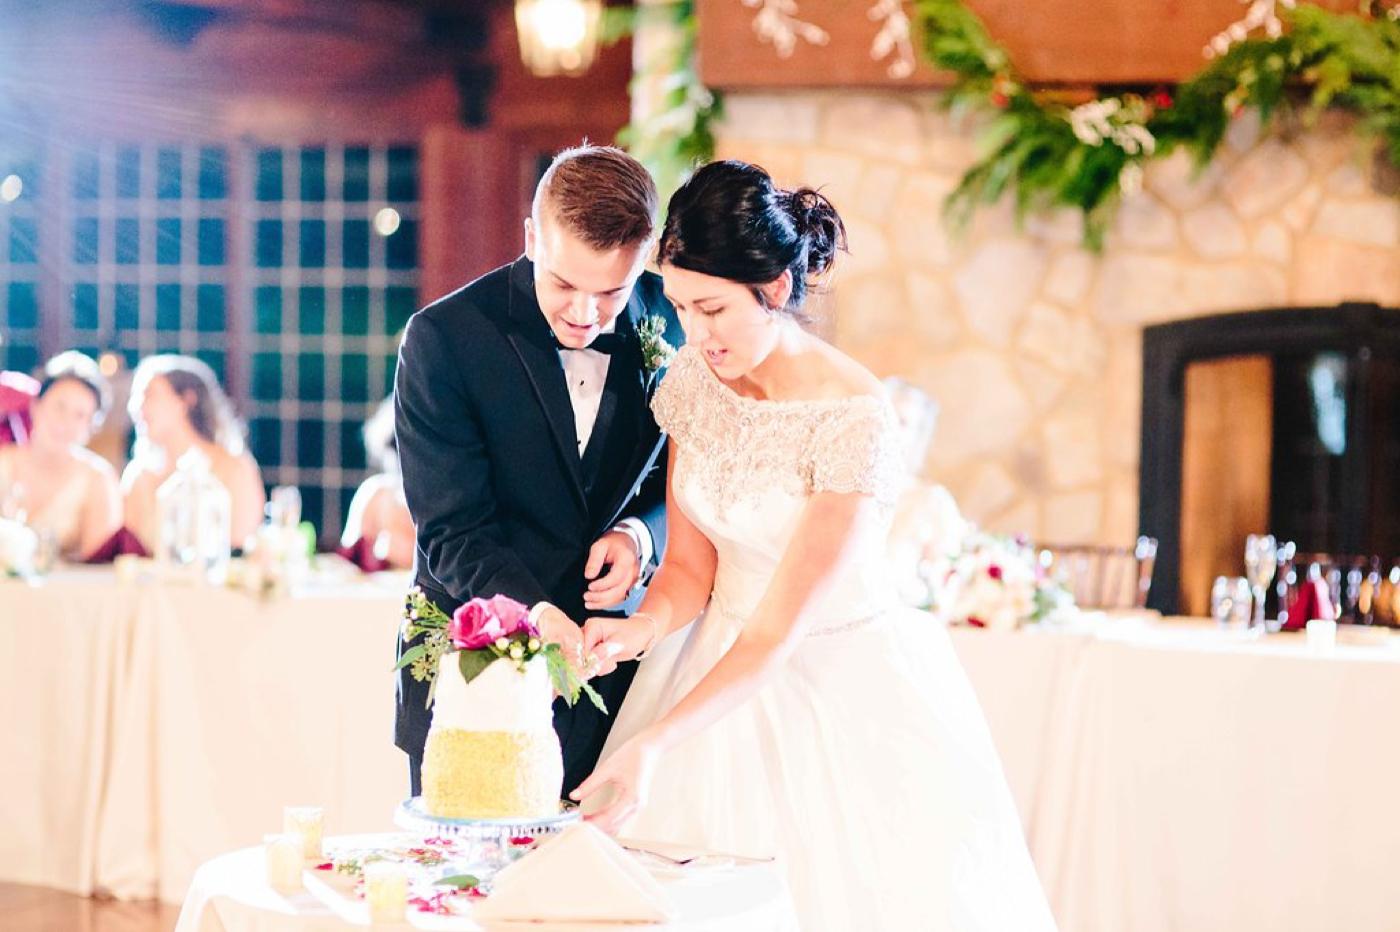 chicago-fine-art-wedding-photography-jacobs38